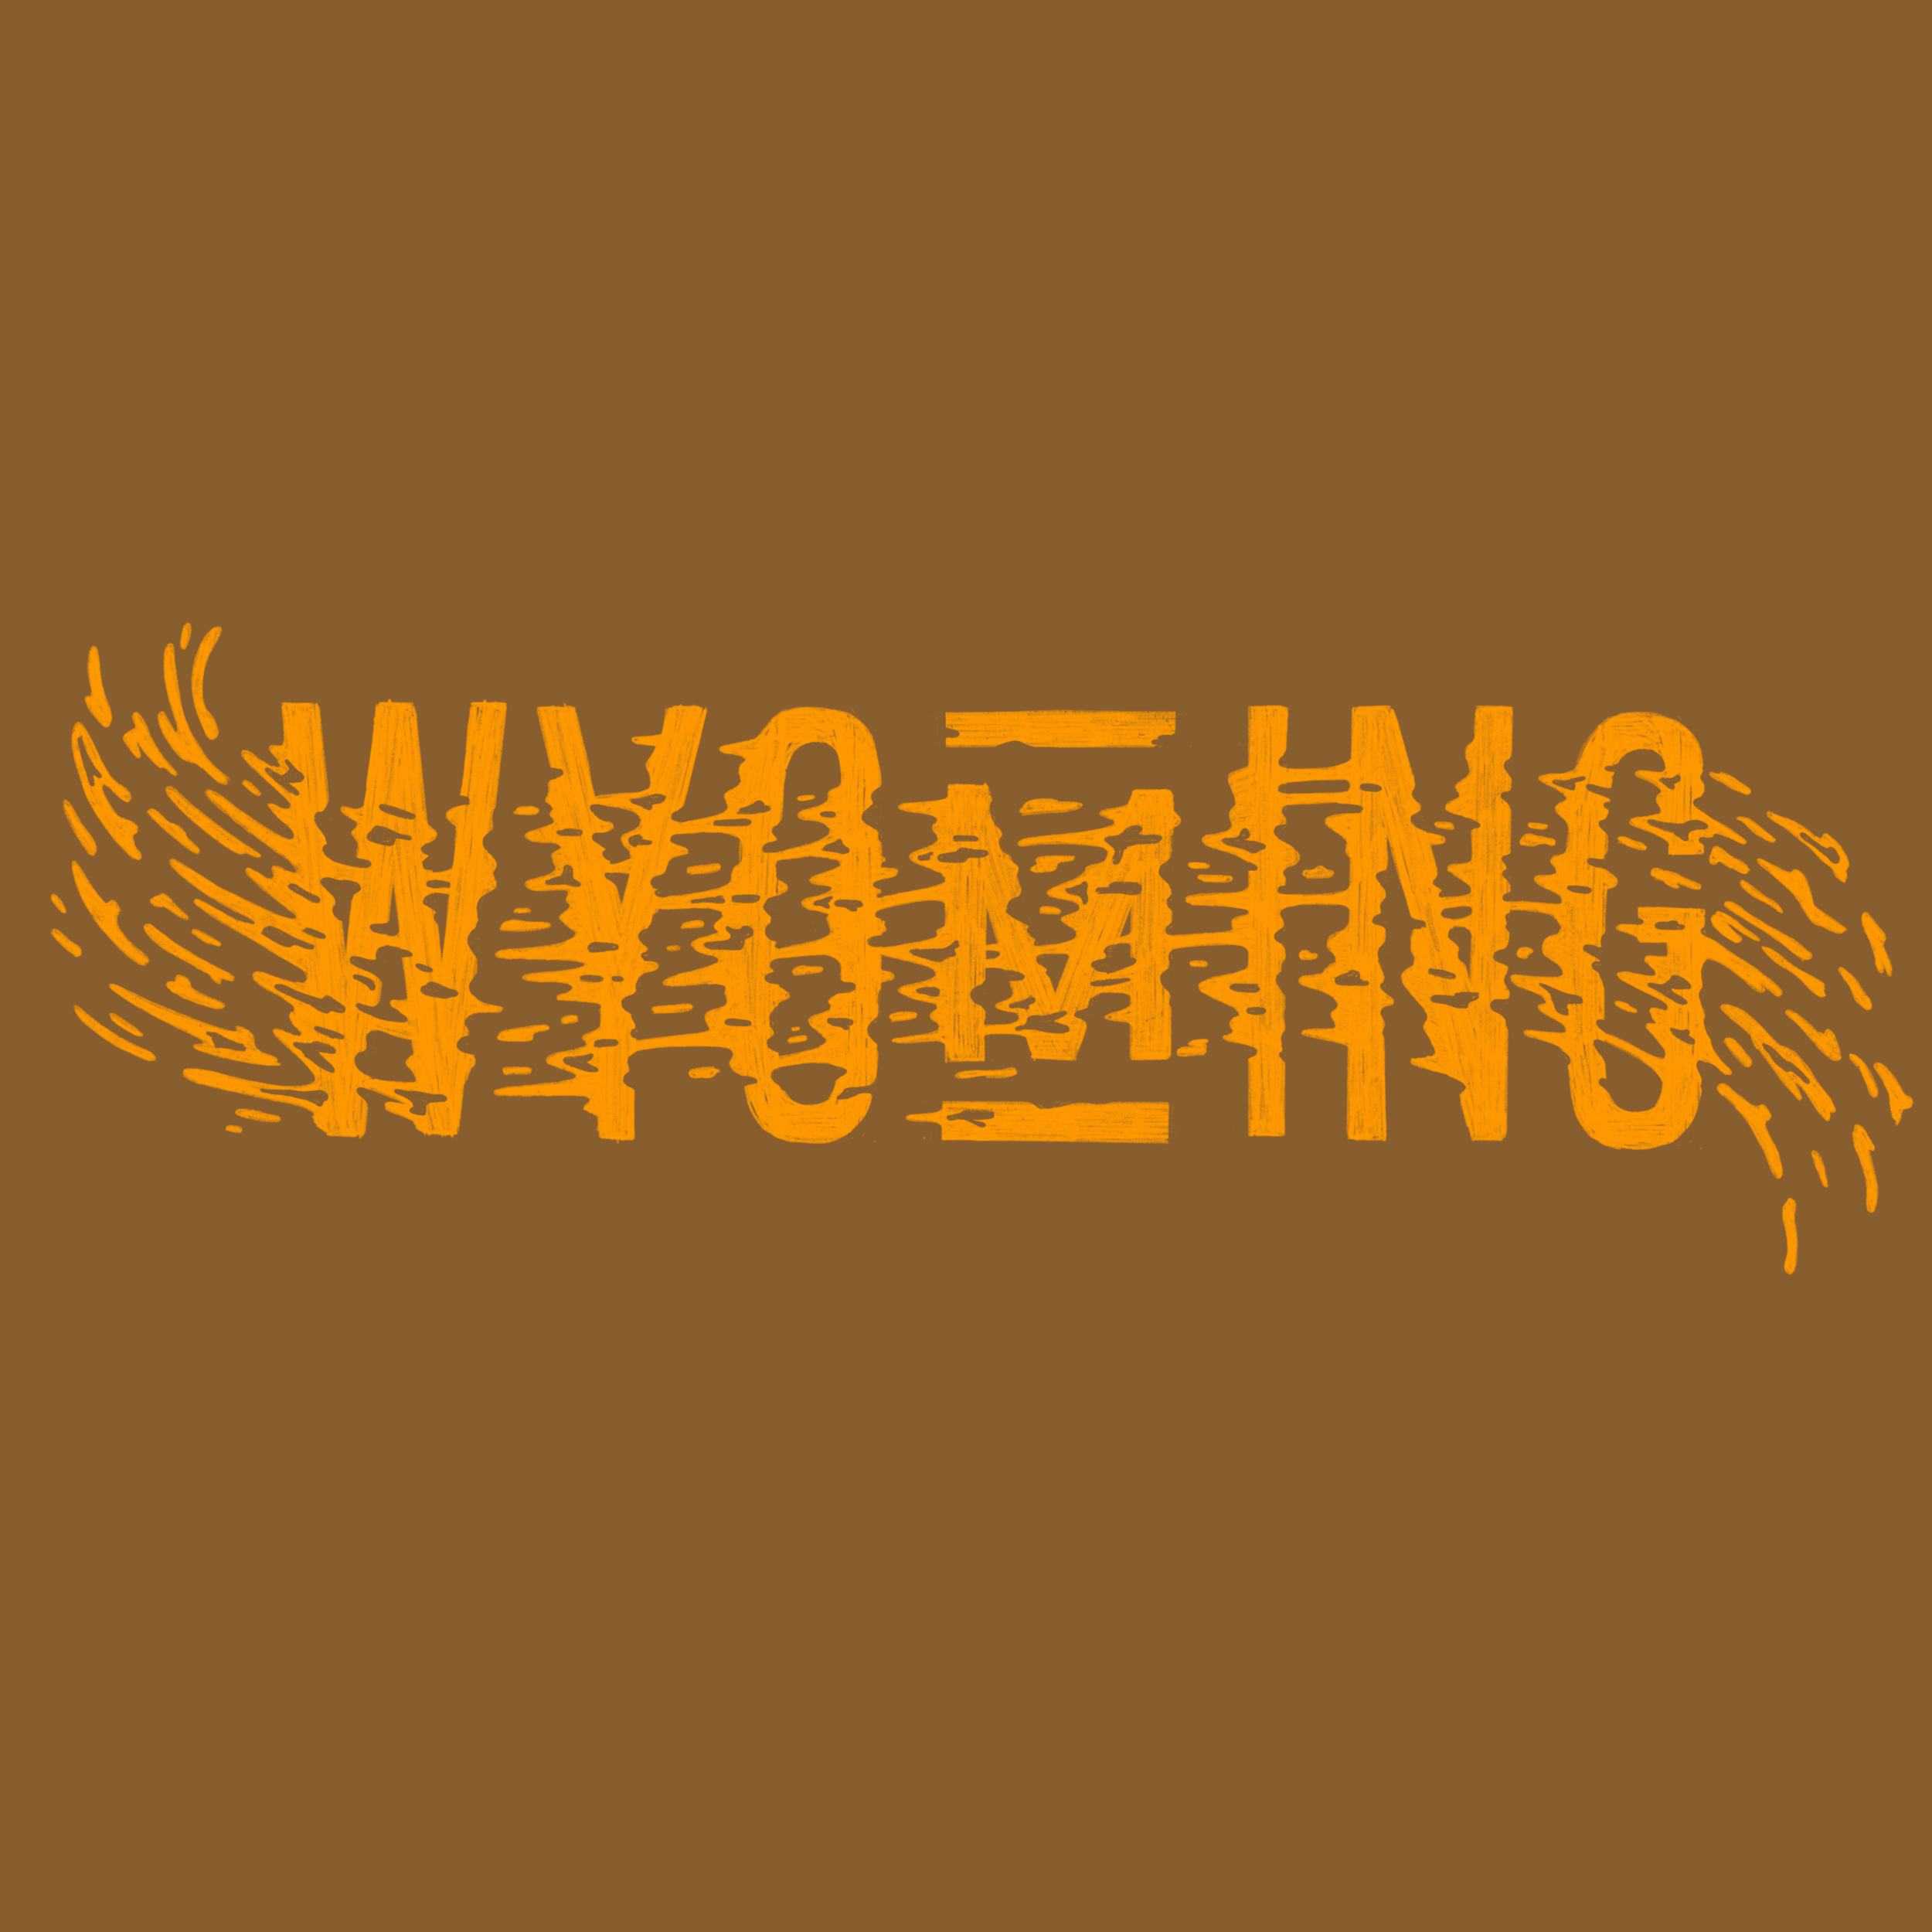 wyoming copy.png